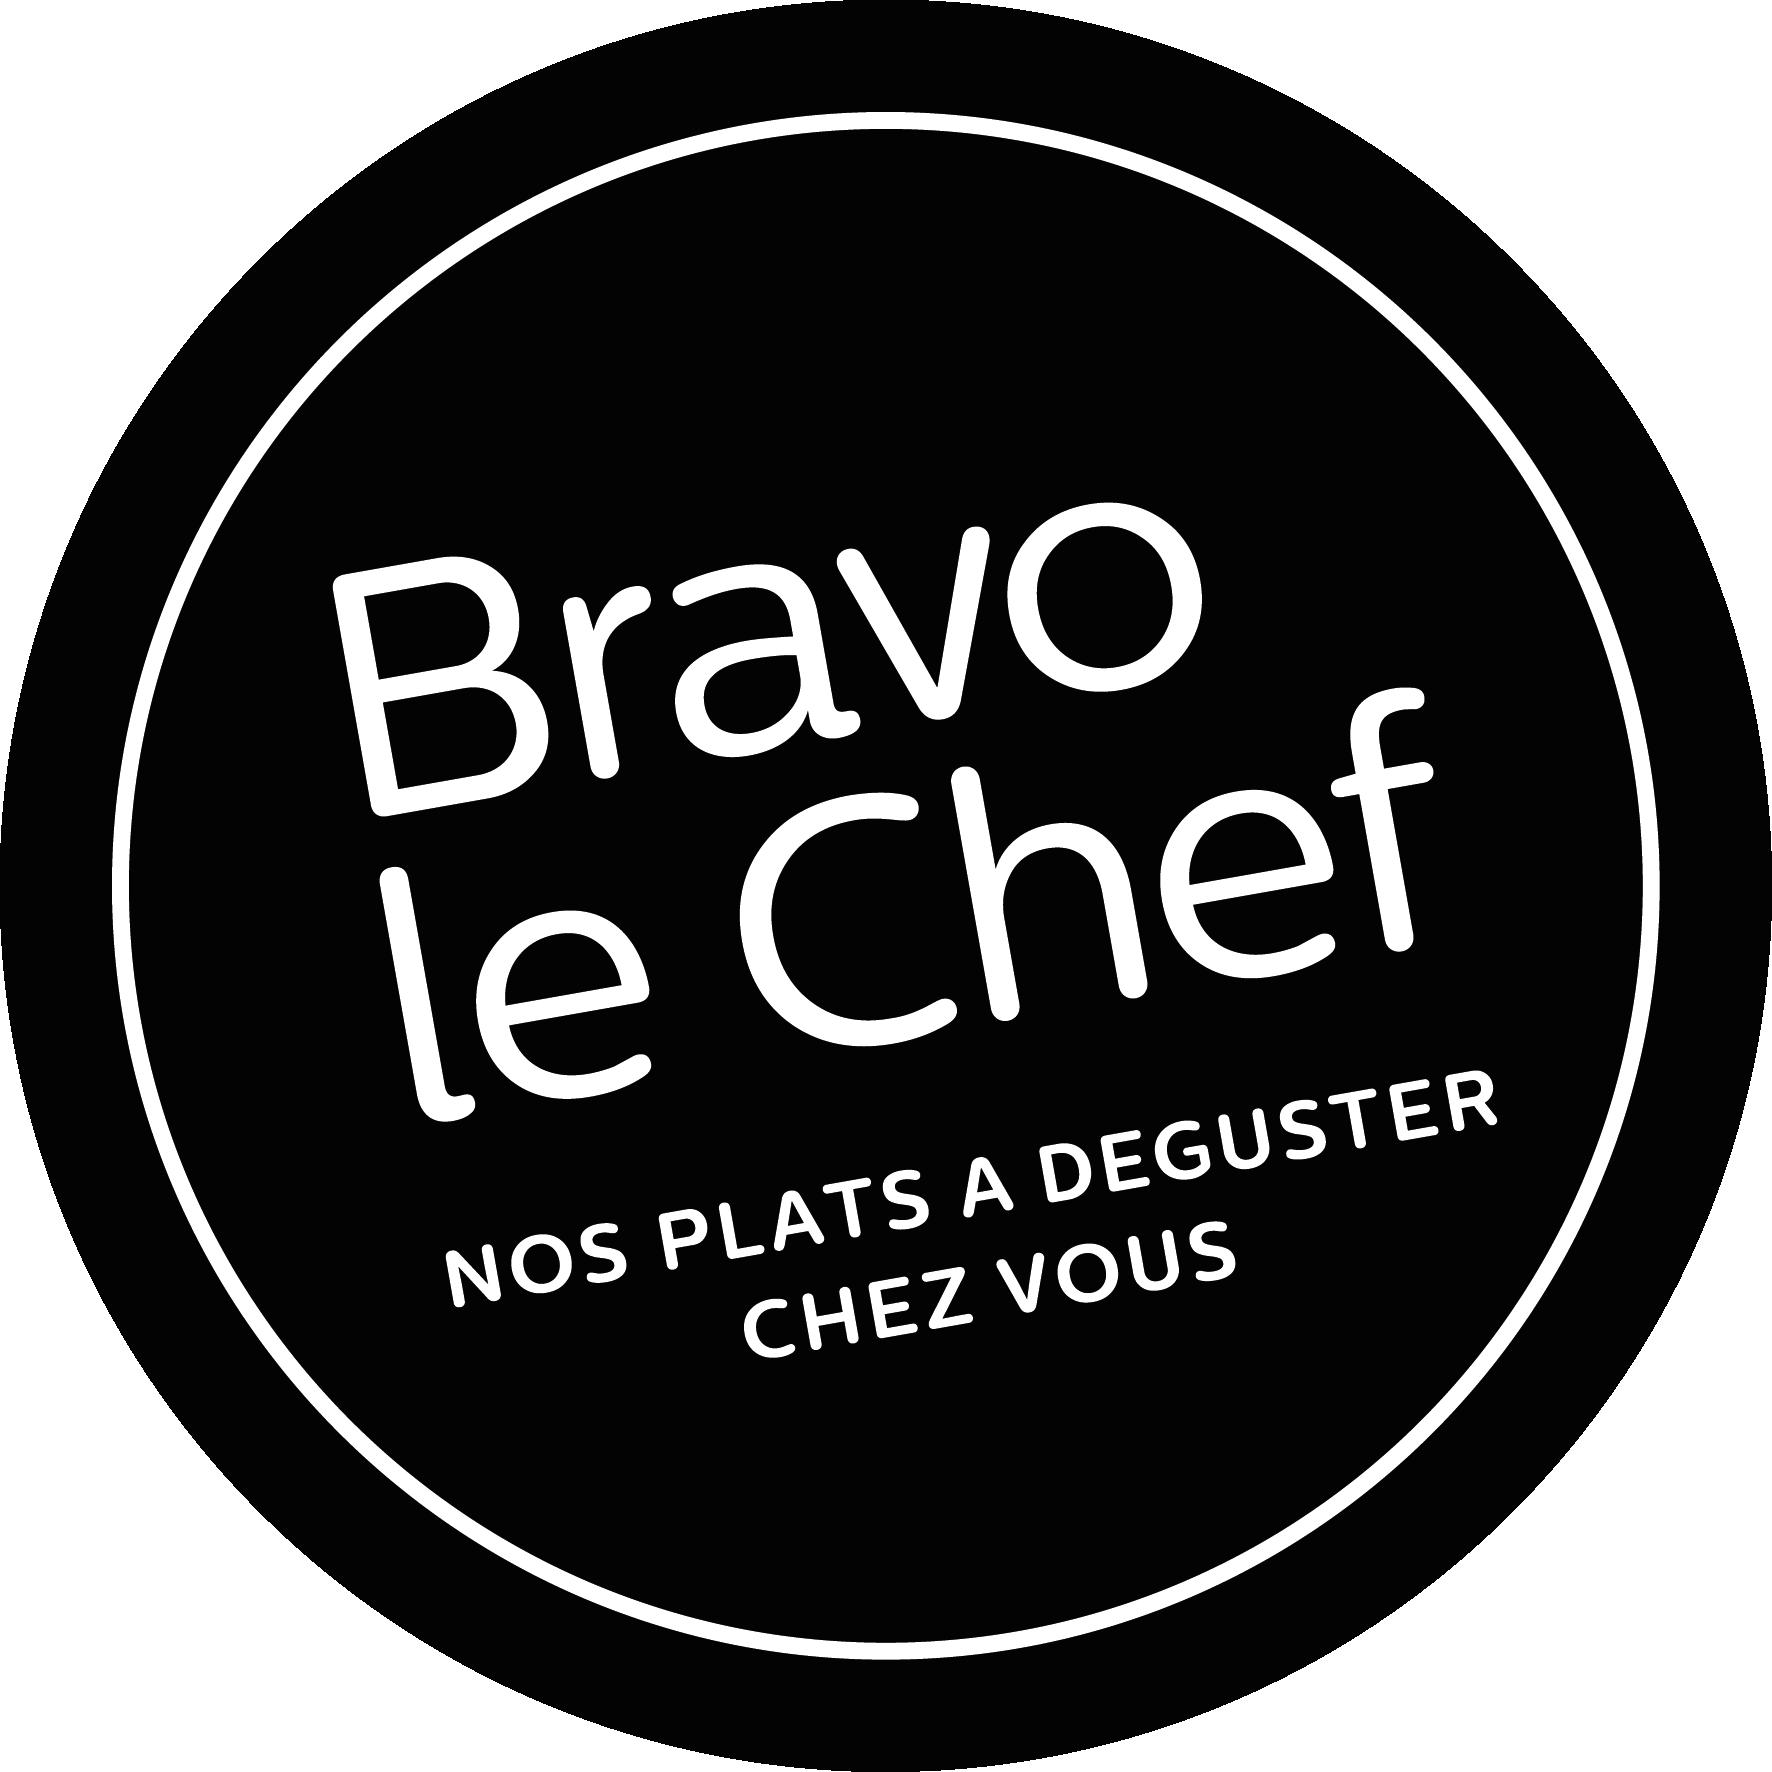 [PIKTEO] Bravo Le Chef - Logotype